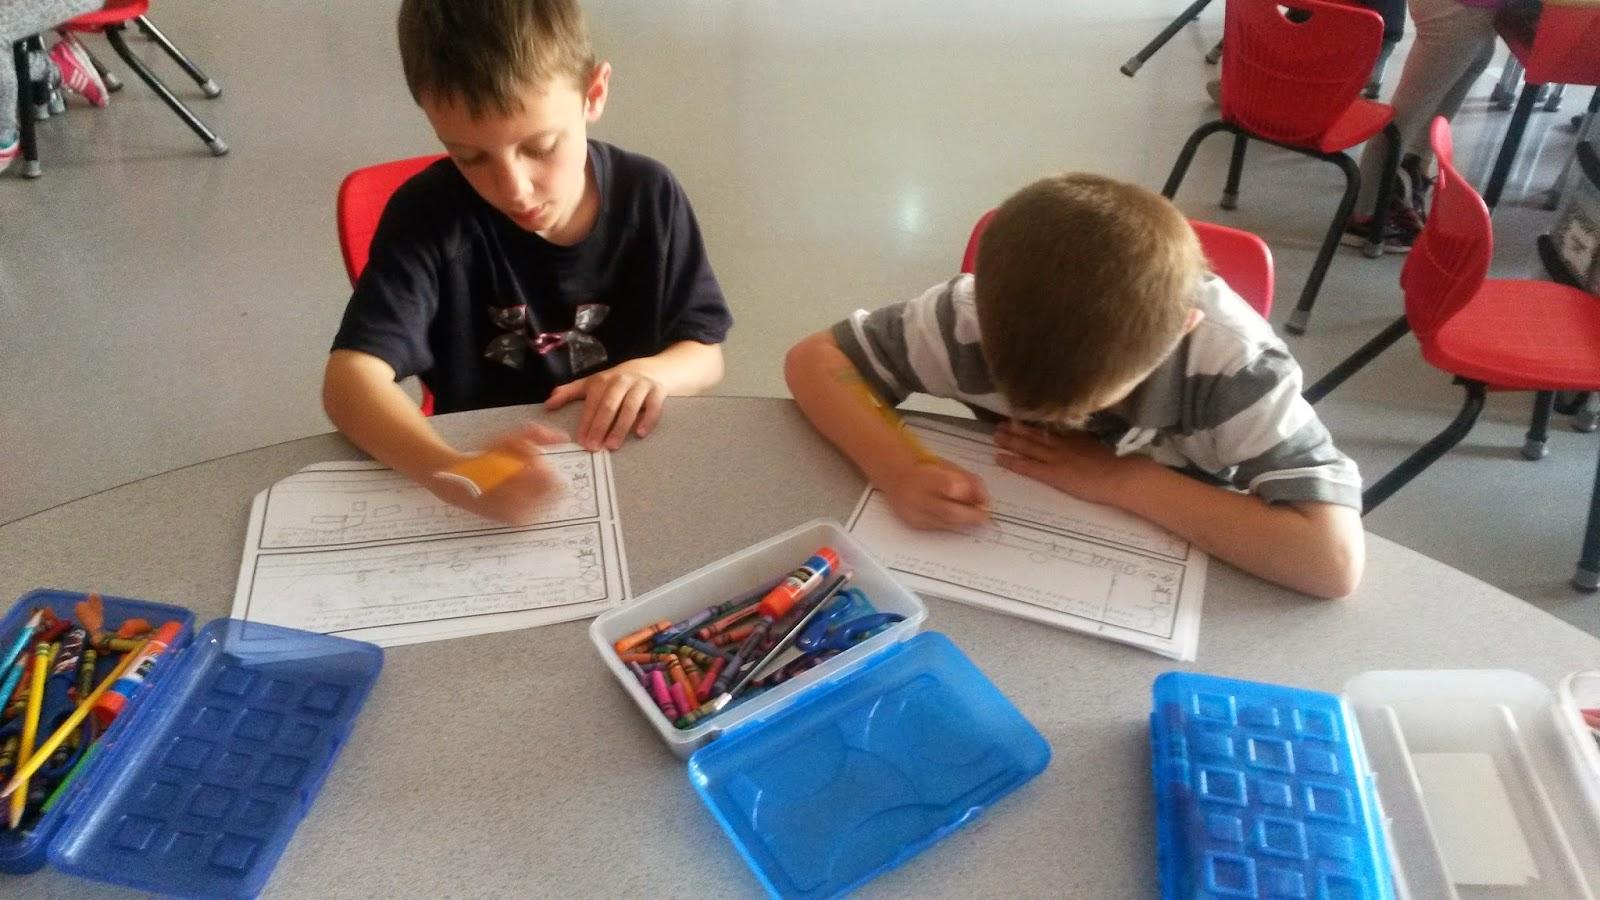 http://www.teacherspayteachers.com/Product/Word-Problem-SUPER-Solvers-An-Editable-Math-Intervention-for-Success-1167666